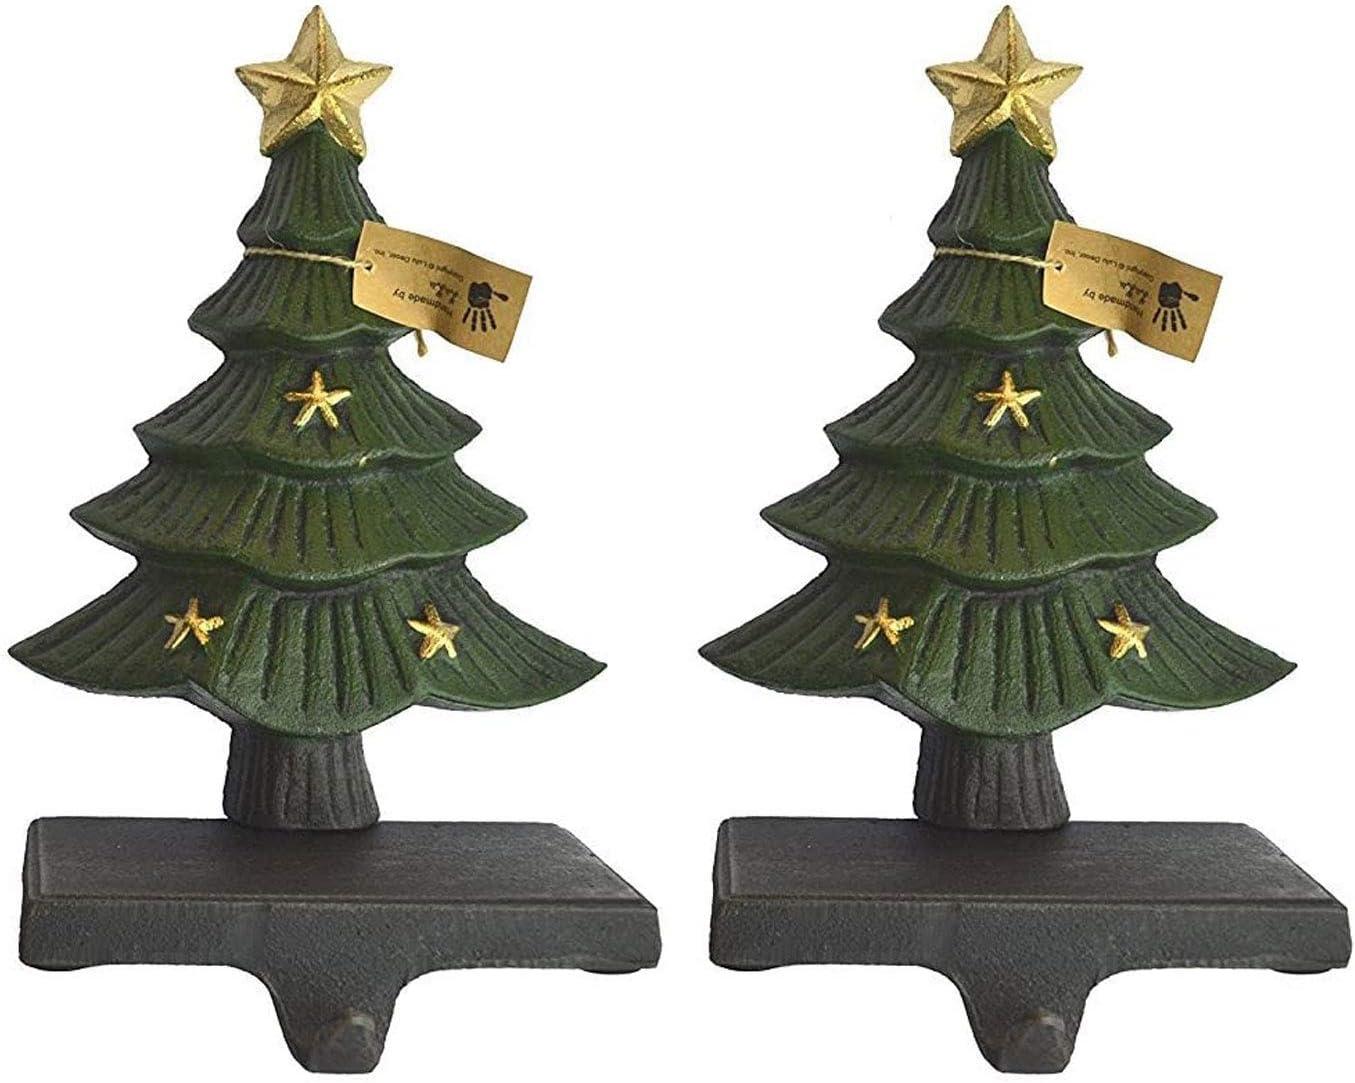 Lulu Decor, Cast Iron Decorative Christmas Tree Stocking Holder, Solid, Beautiful, 2 Piece, Perfect, Stocking Hanger (2 Trees Stars)